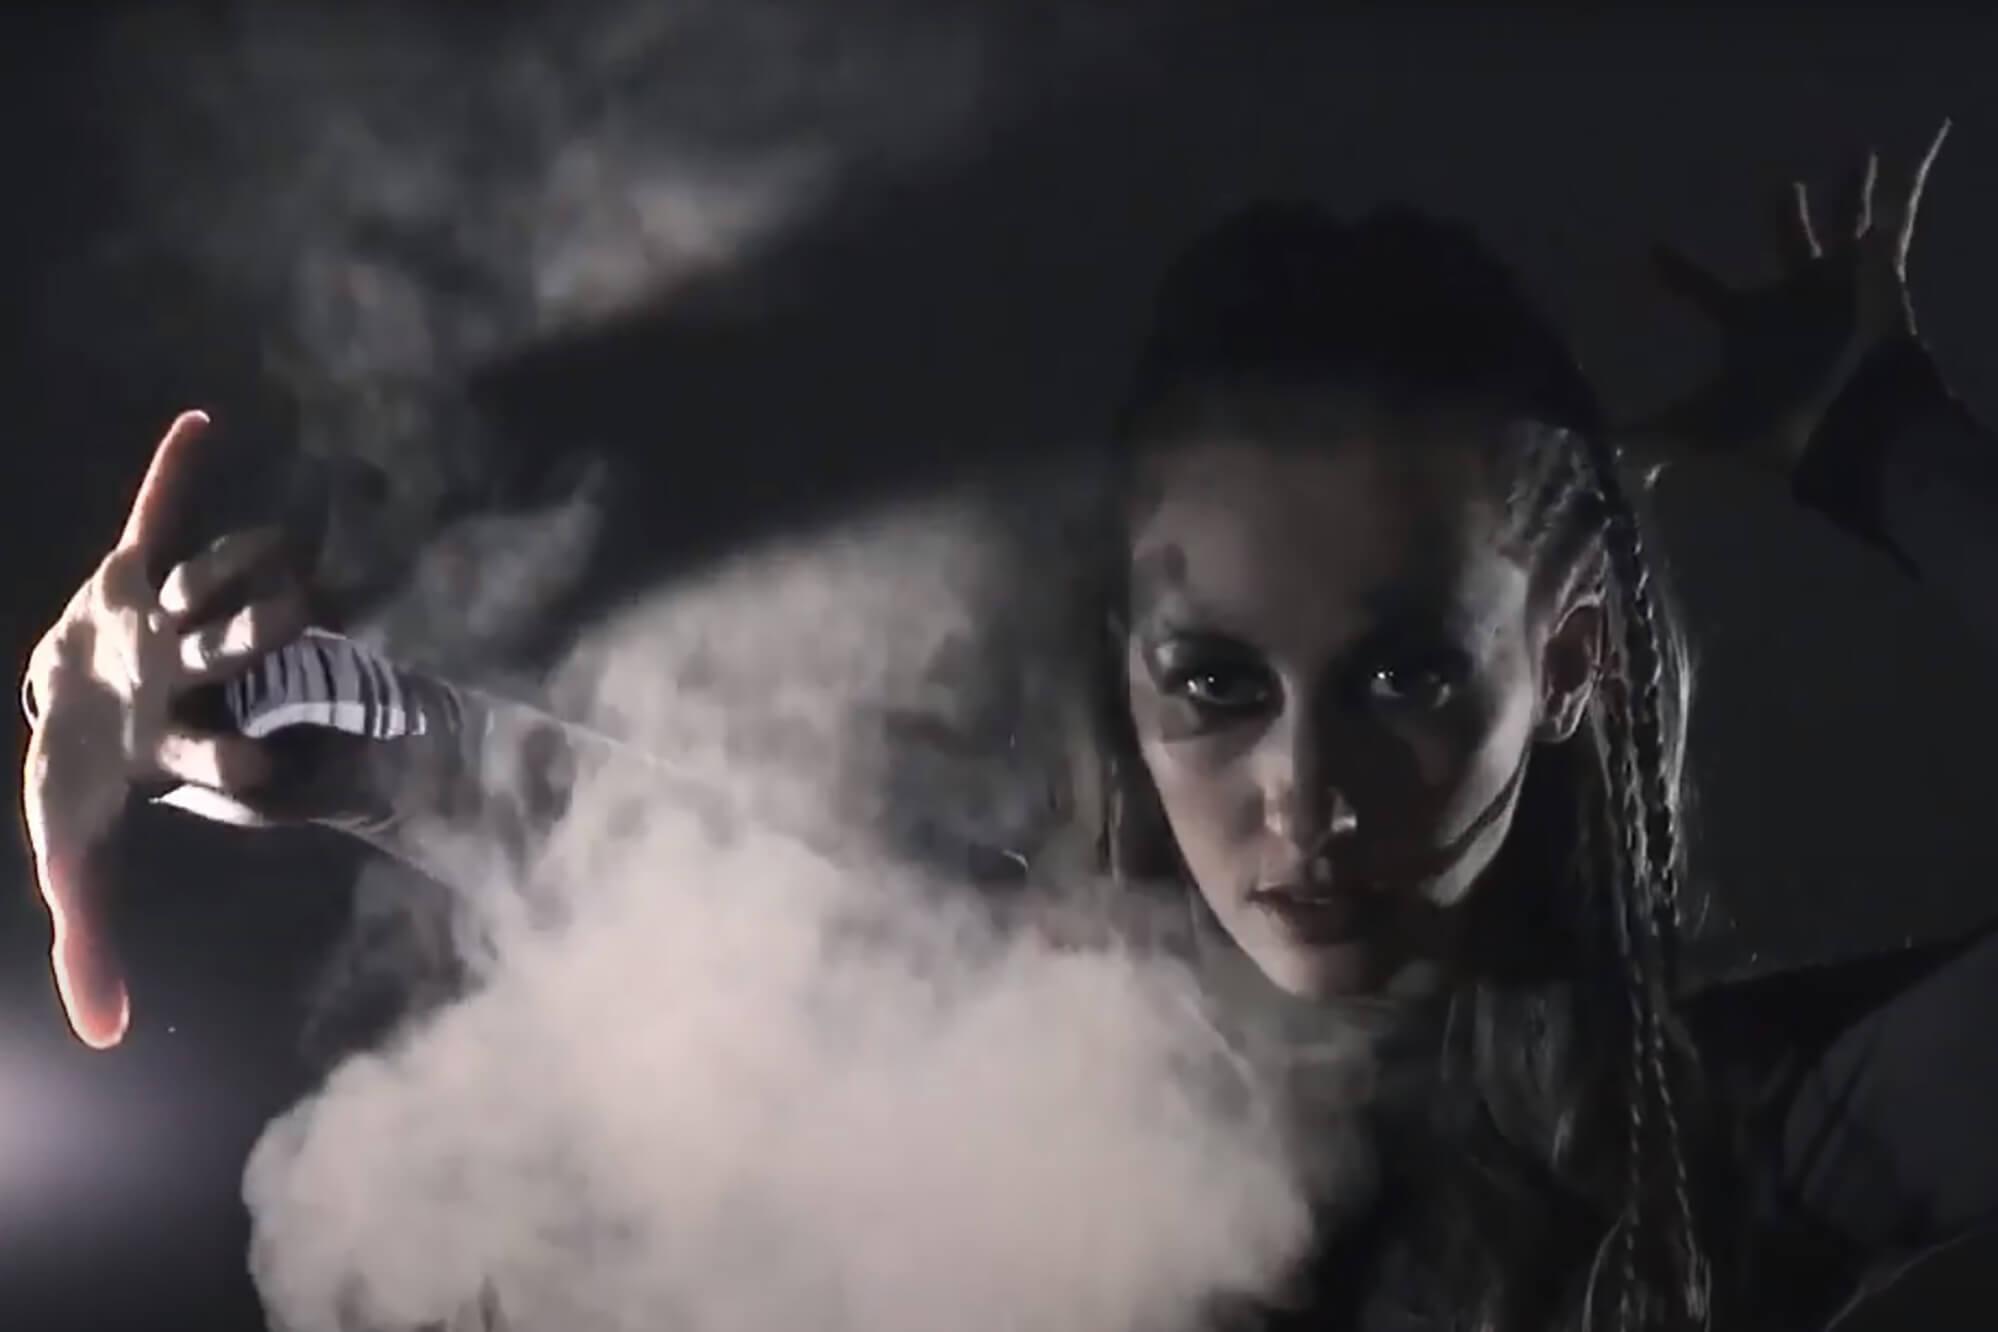 A young woman wearing striking make-up dances through smoke